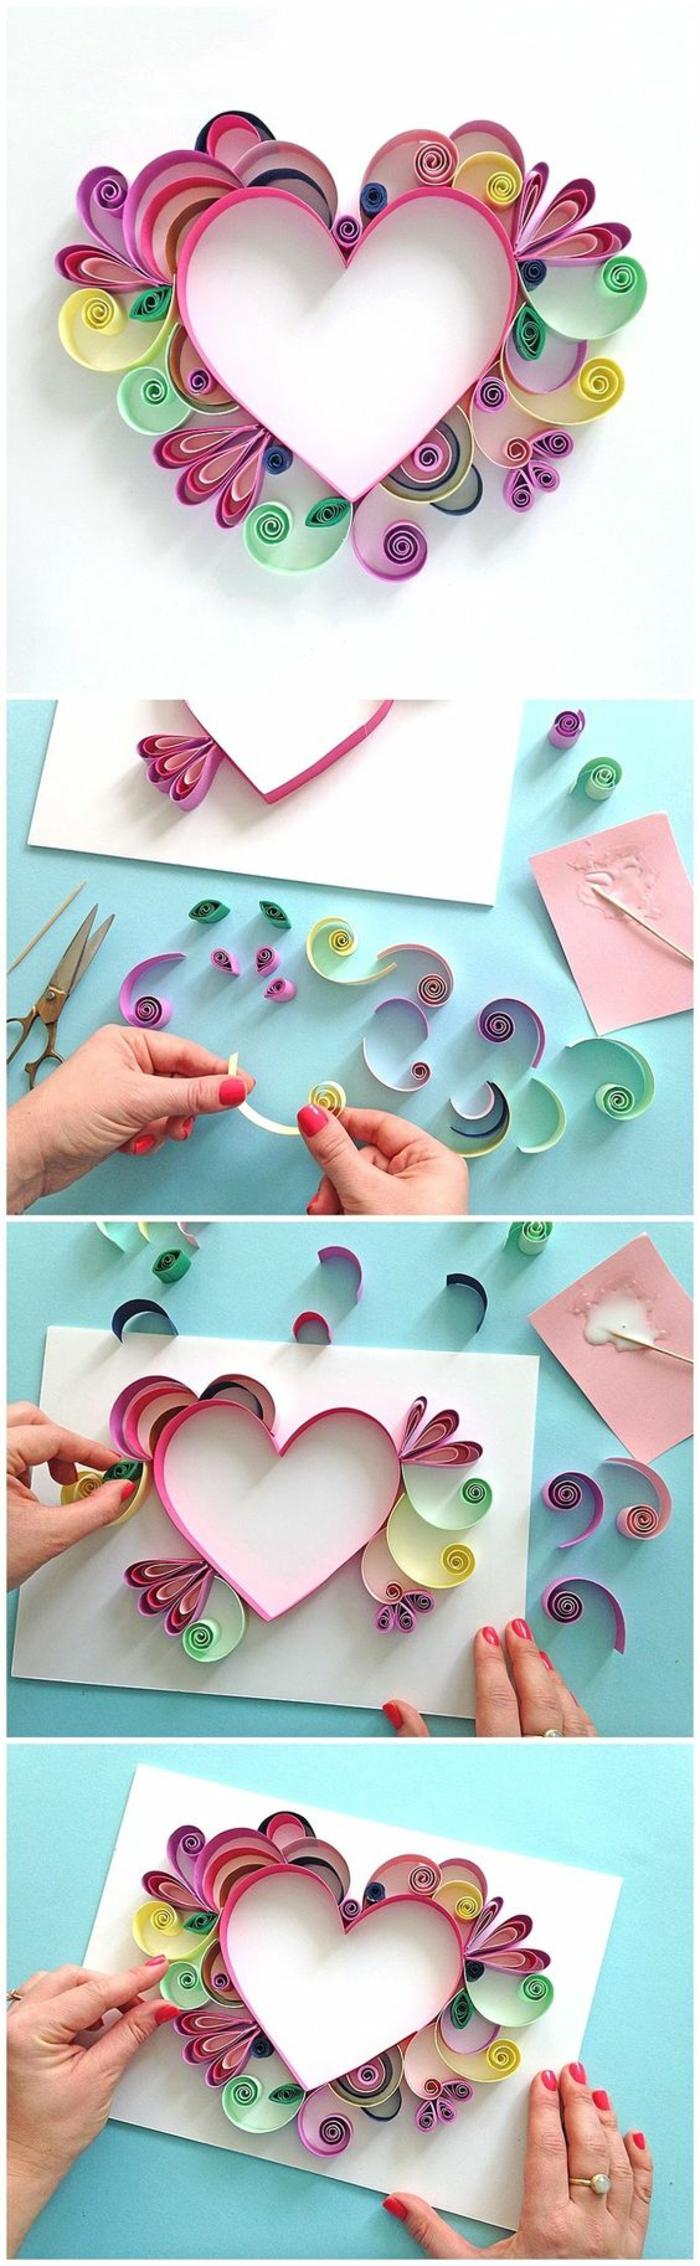 ideas para hacer cuadros Ideas Para Pintar Un Cuadro Facil 10 Ideas Para Pintar De